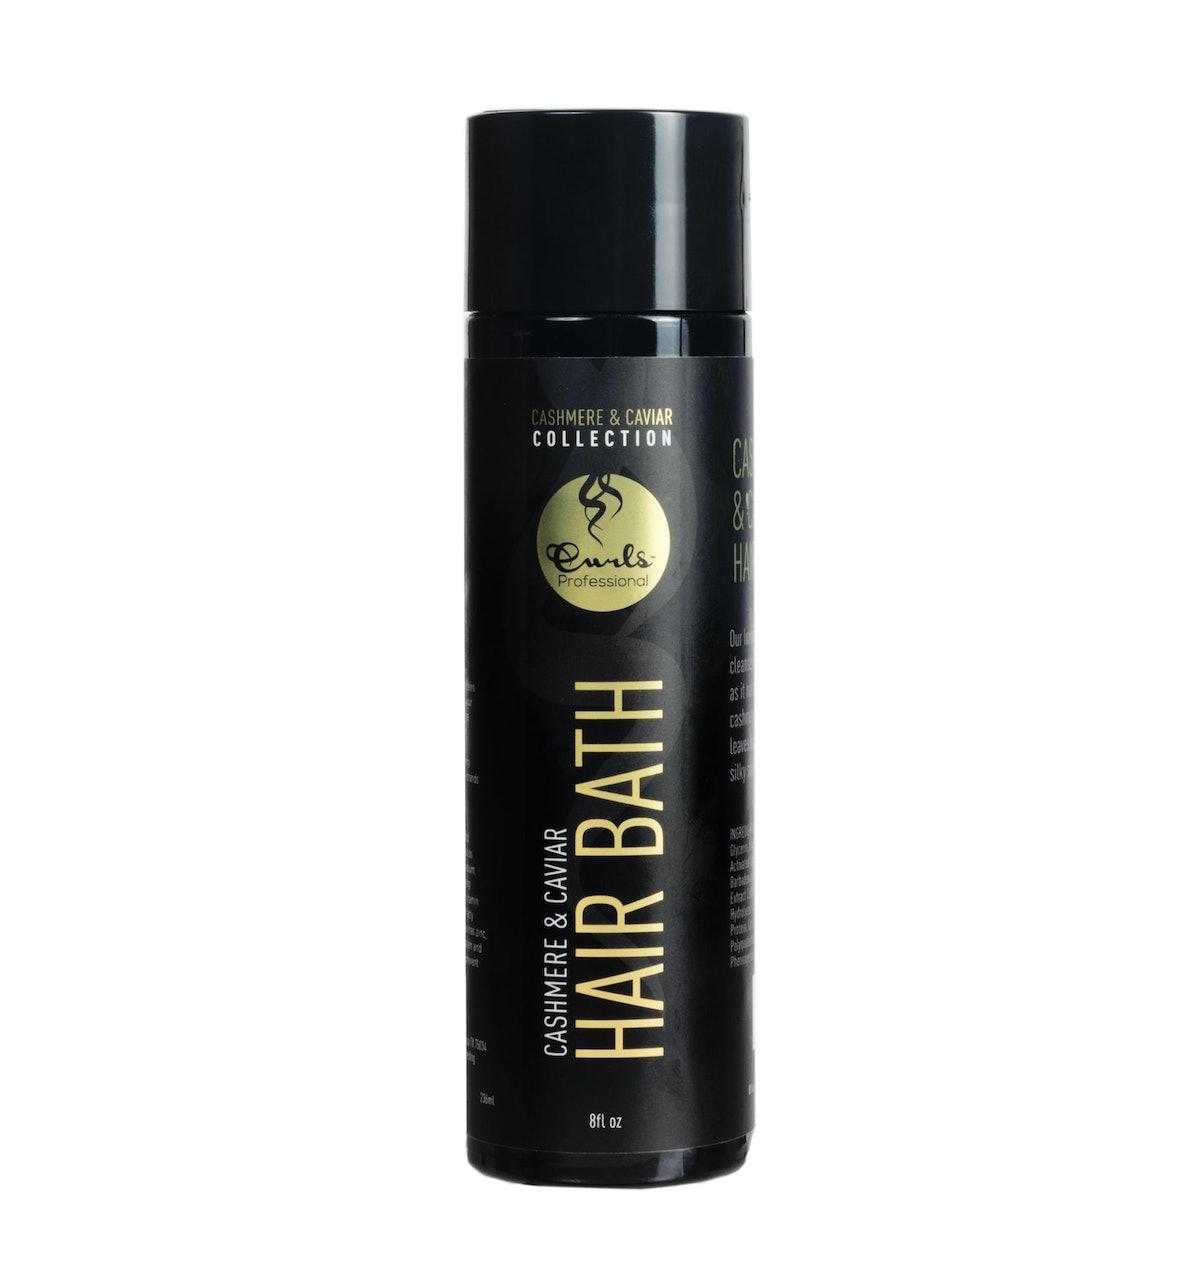 Cashmere + Caviar Hair Bath